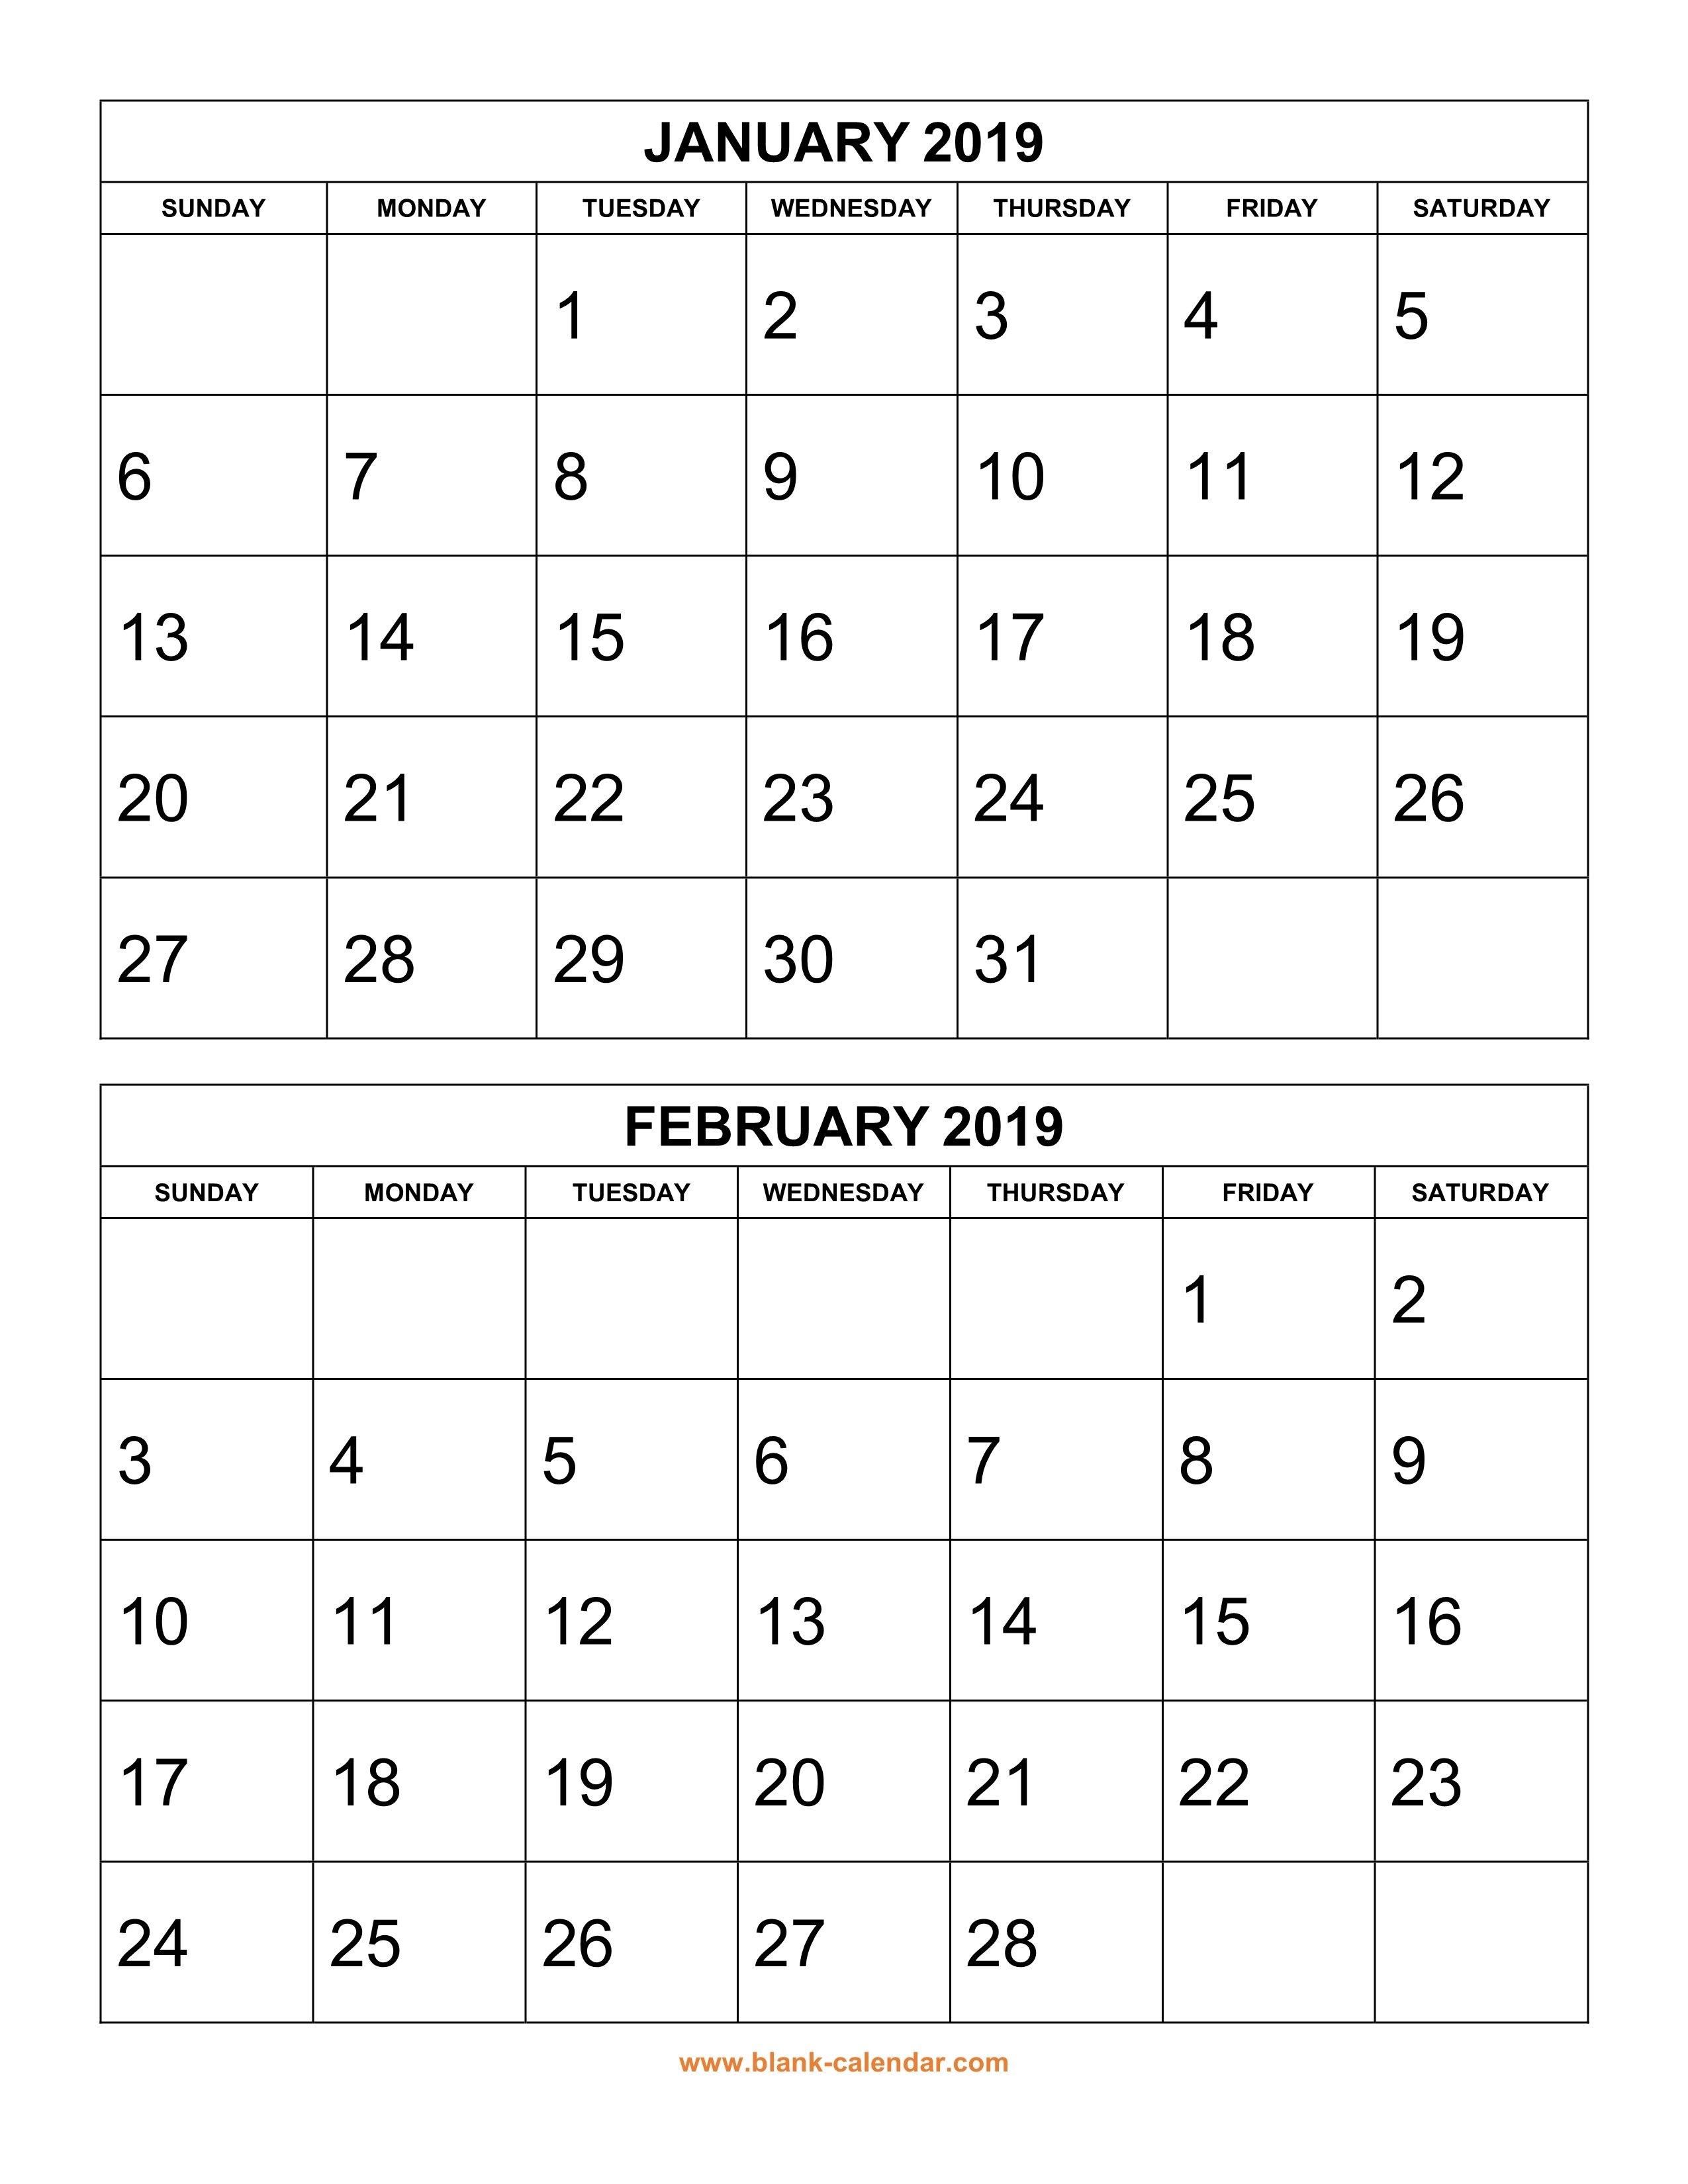 Free Download Printable Calendar 2019, 2 Months Per Page, 6 Pages Calendar 2019 Free Download